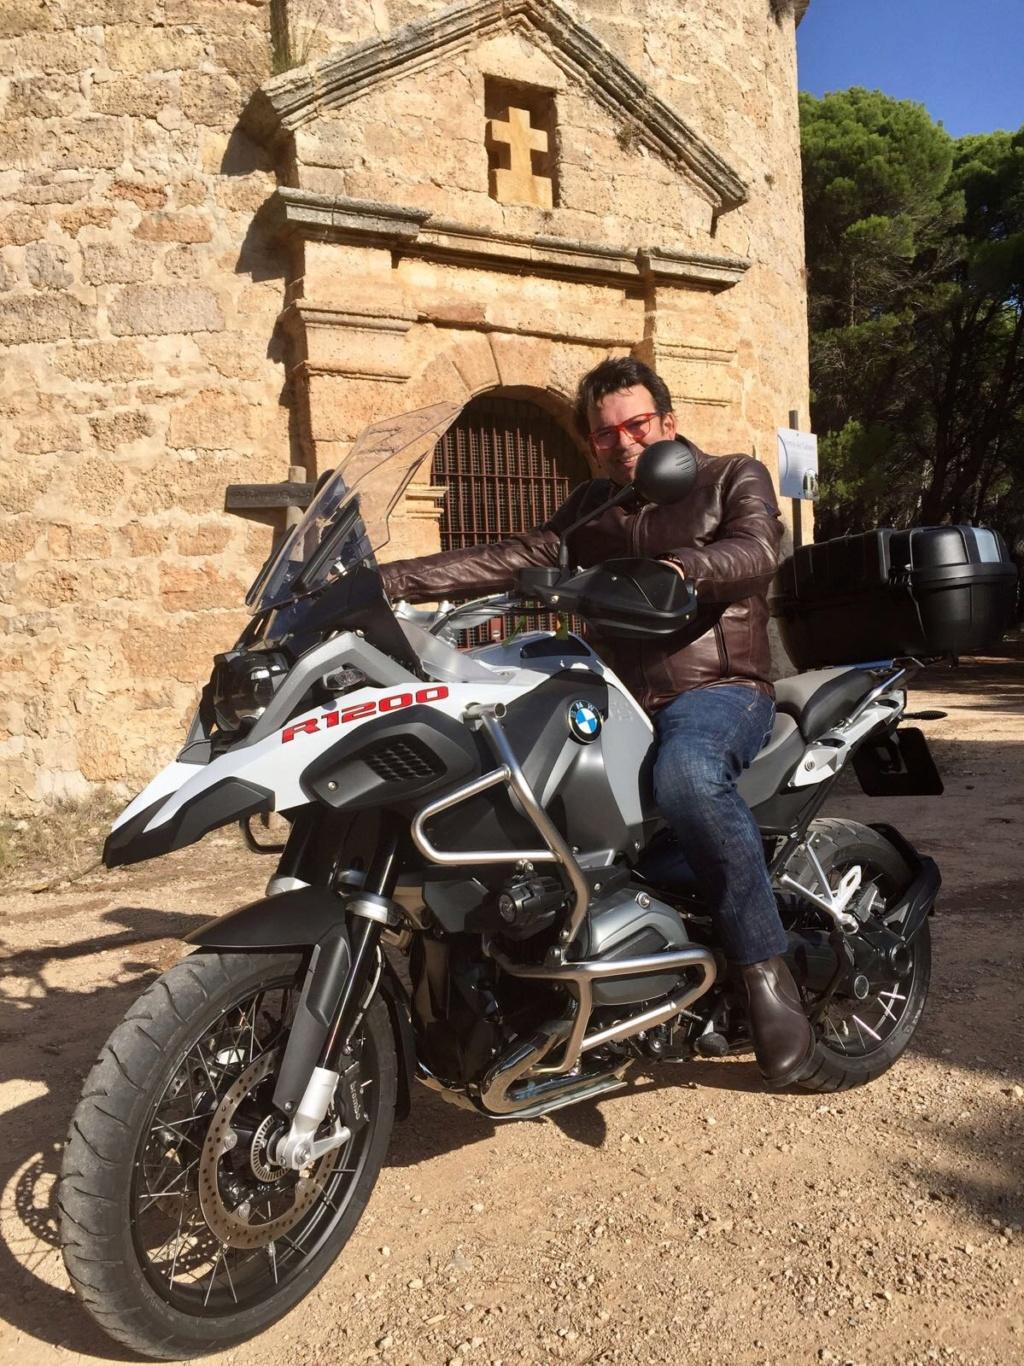 senda - Tu moto moderna o de uso habitual - Página 12 Img_8111